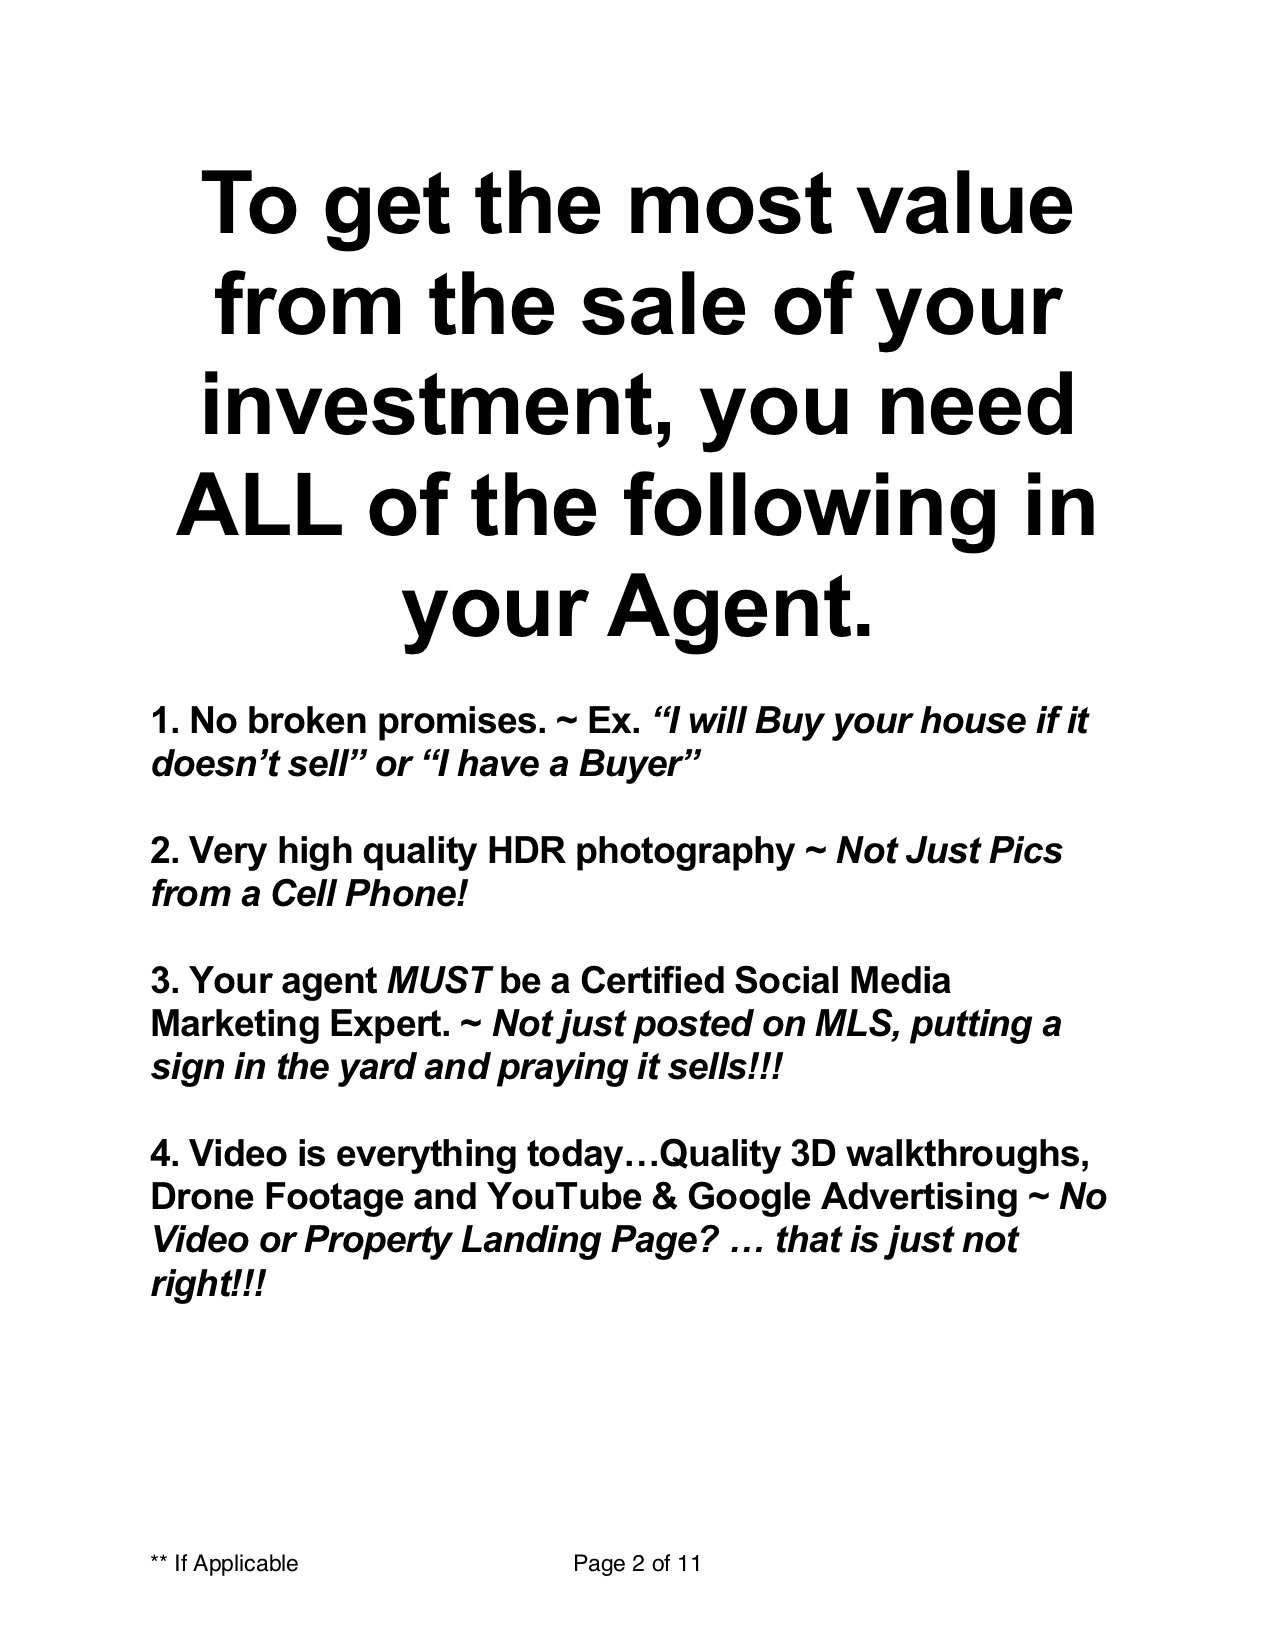 8 Week Marketing Plan2.jpg